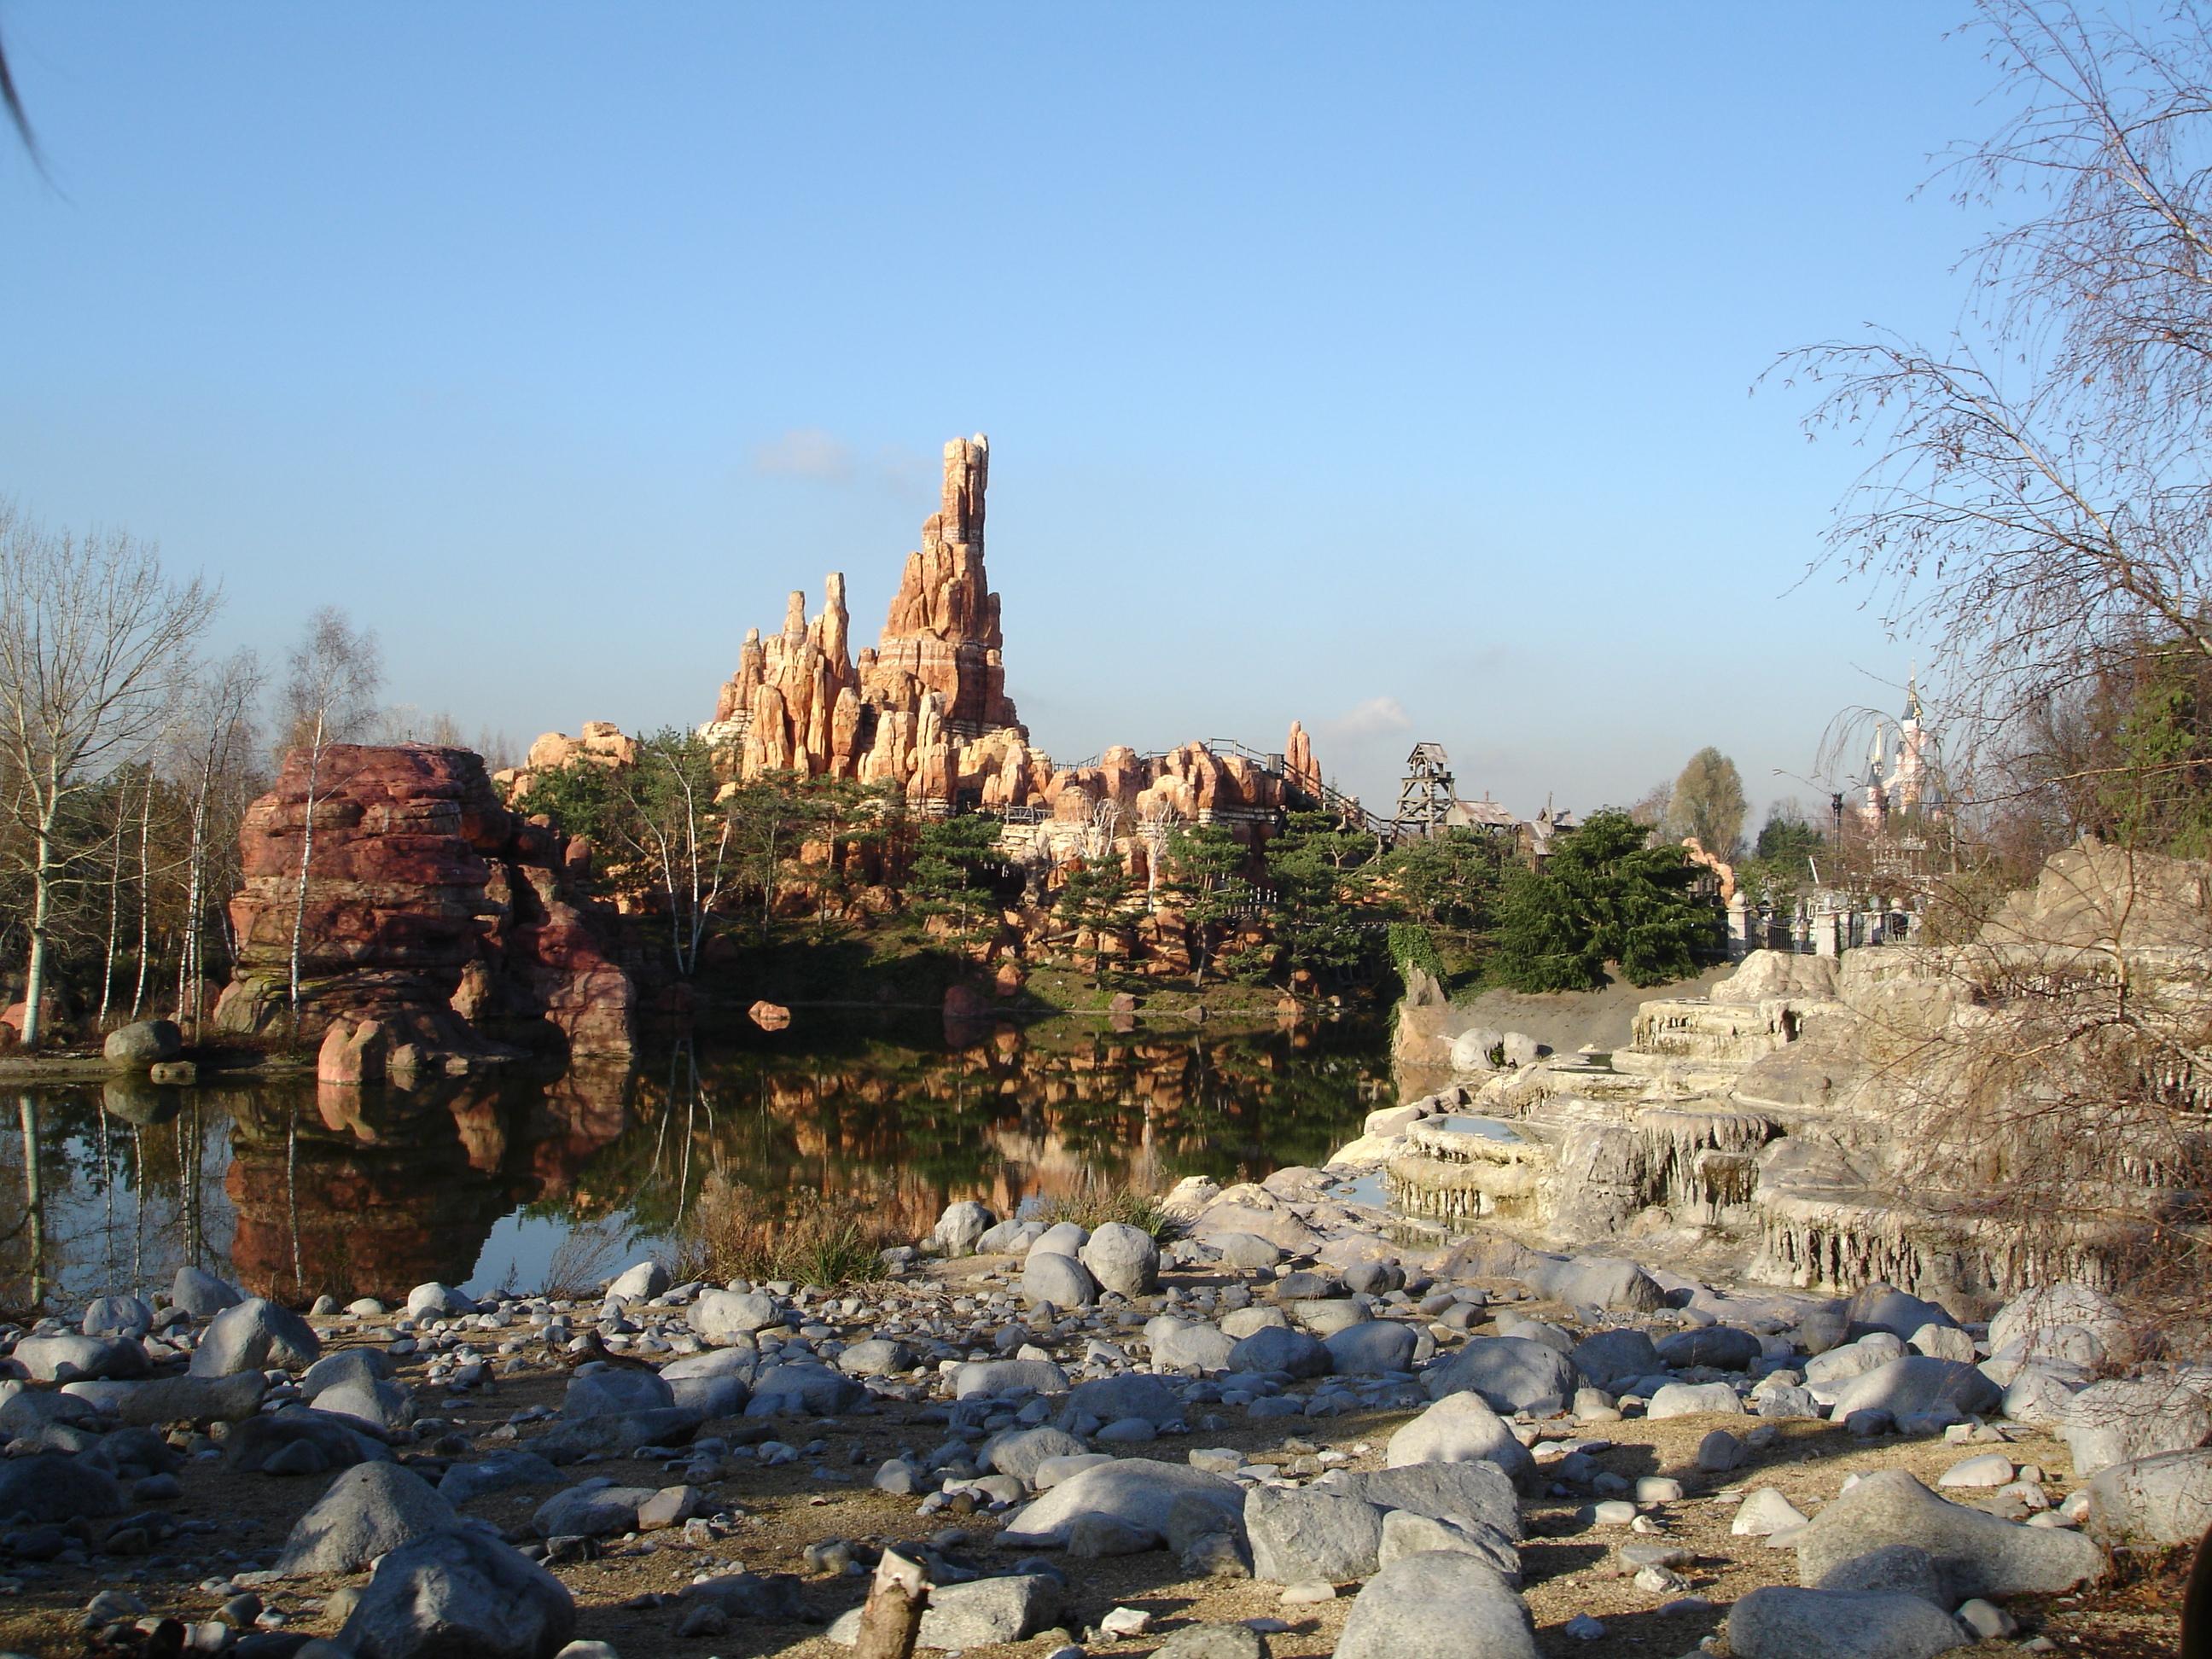 Euro Disneyland Van Dorn Abed Landscape Architect Portfolio